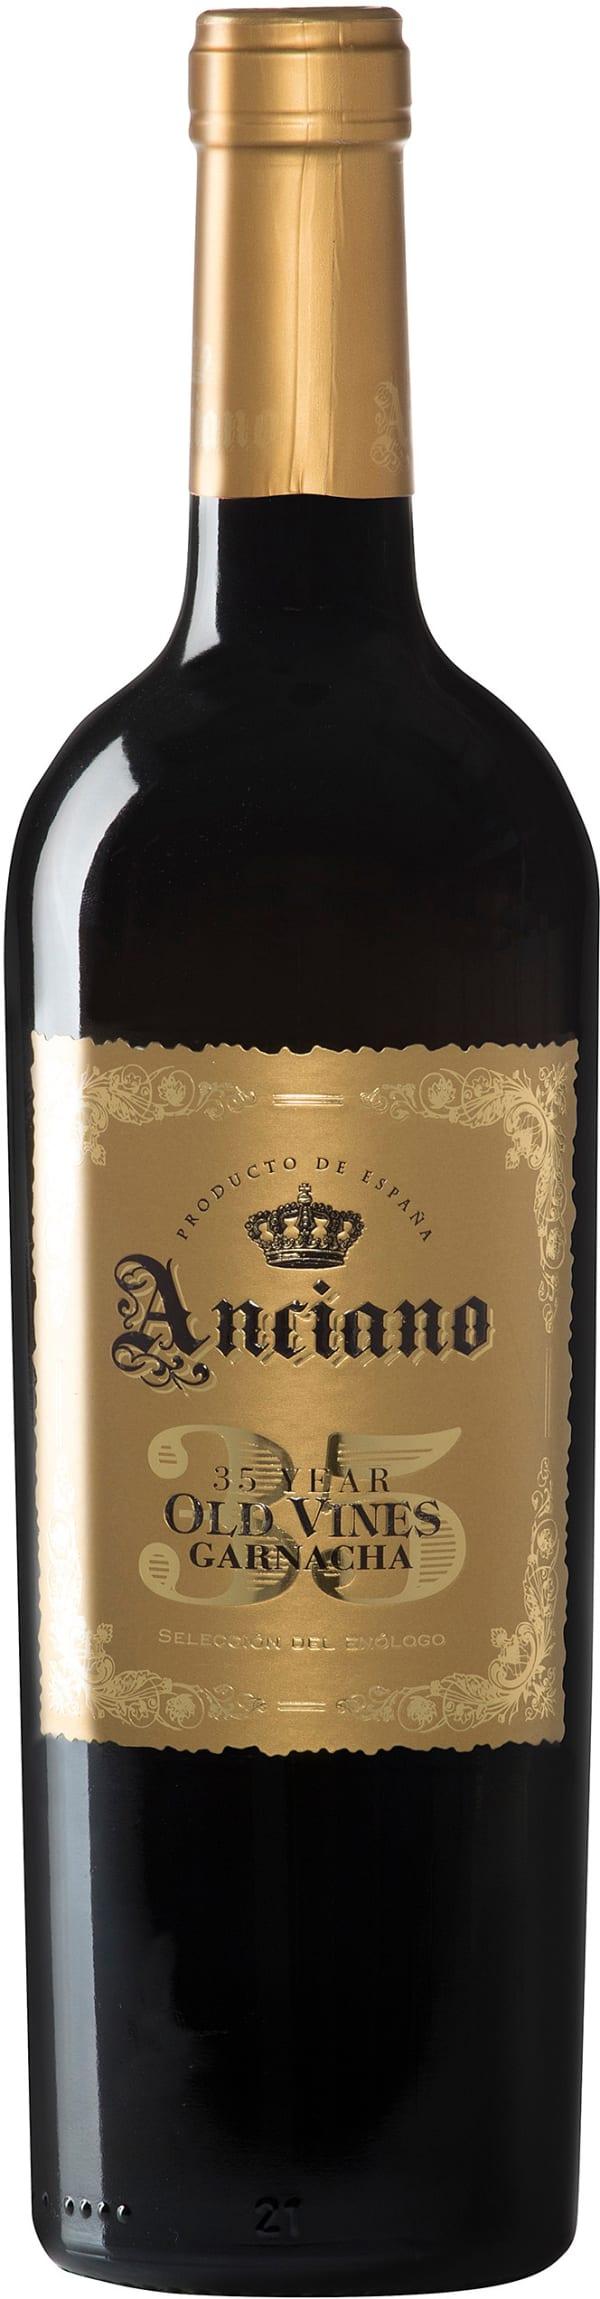 Anciano 35 Year Old Vines Garnacha  2015